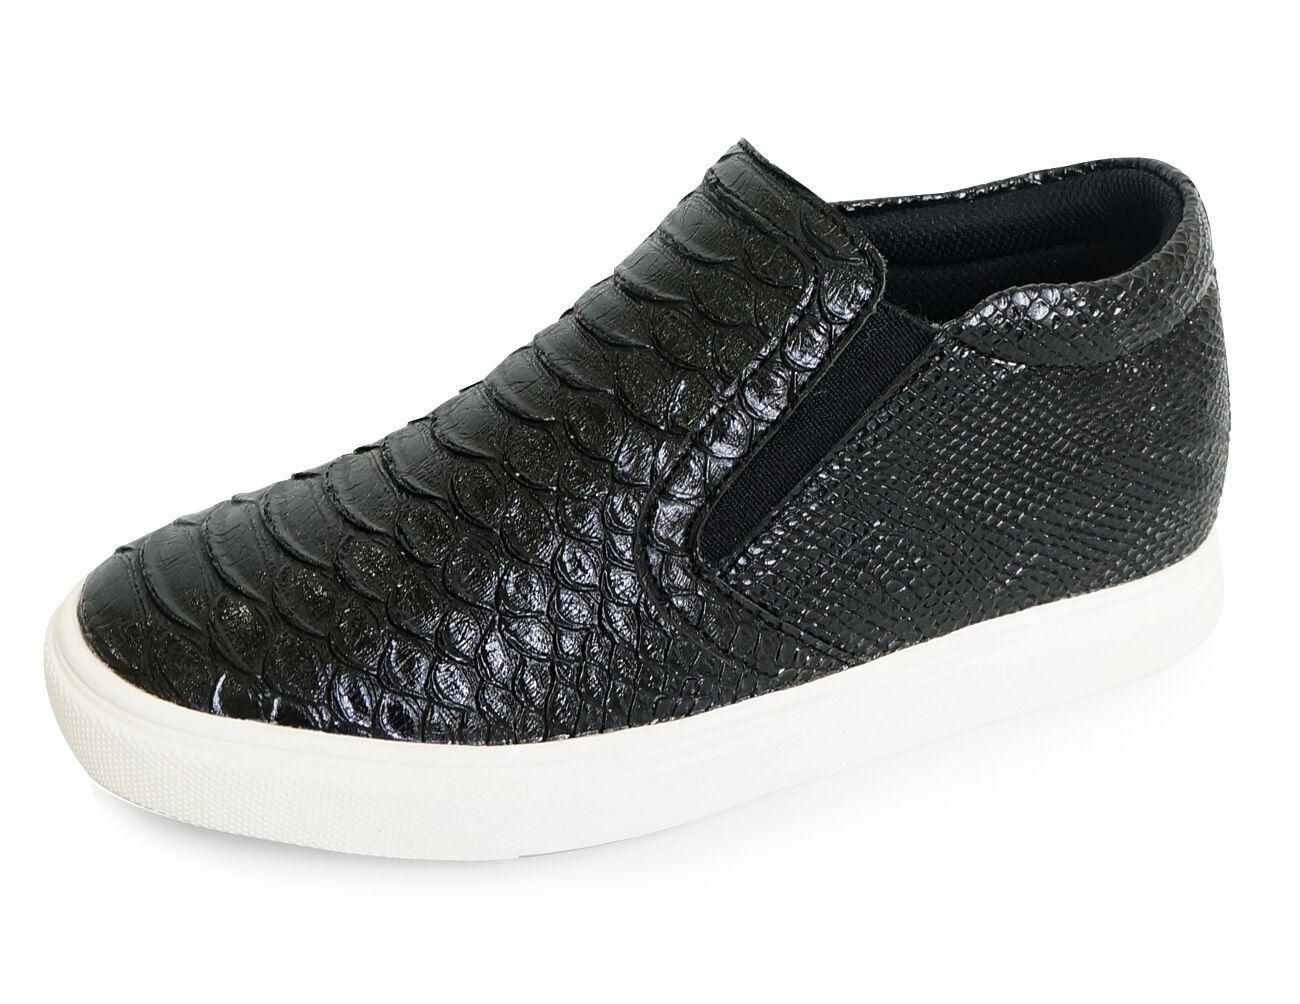 MNX15 Men's Elevator shoes MANGO BLACK Height Increase 6cm by FedEx Fast Ship